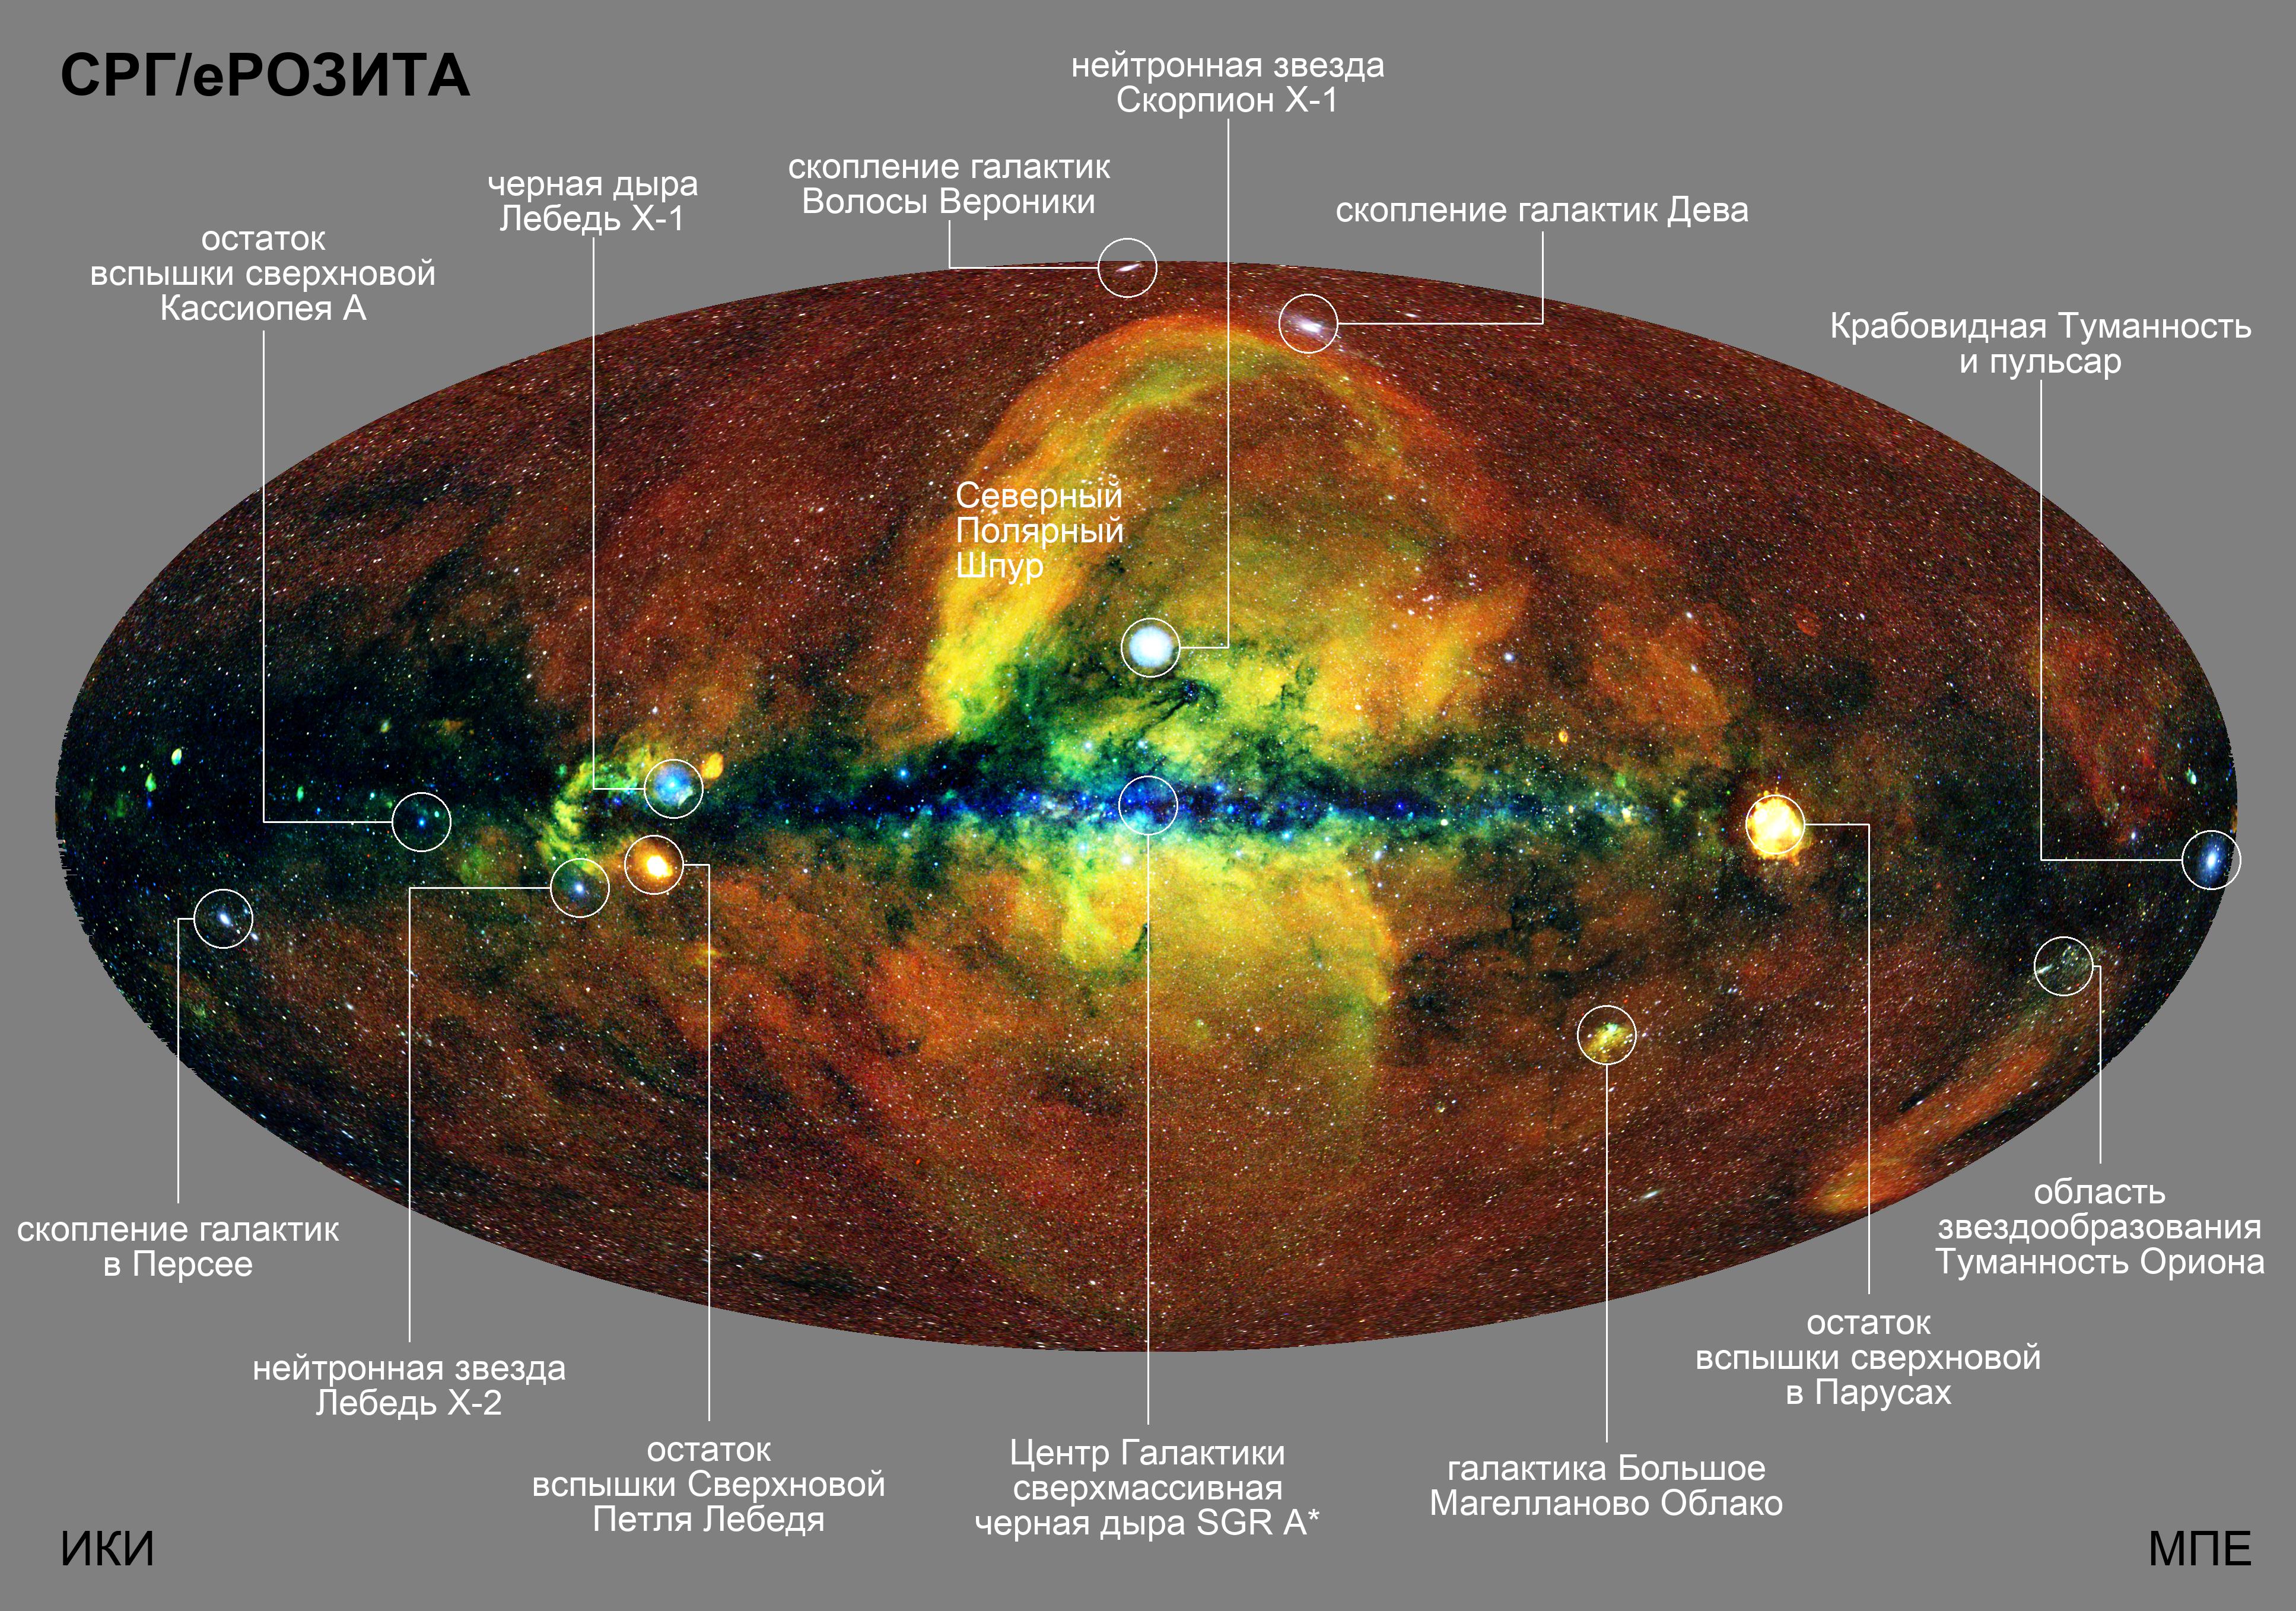 Карта всего неба СРГ/еРОЗИТА (c) М.Гильфанов, Р.Сюняев, Е.Чуразов (ИКИ), H.Brunner, A.Merloni, J.Sanders (МПЕ)